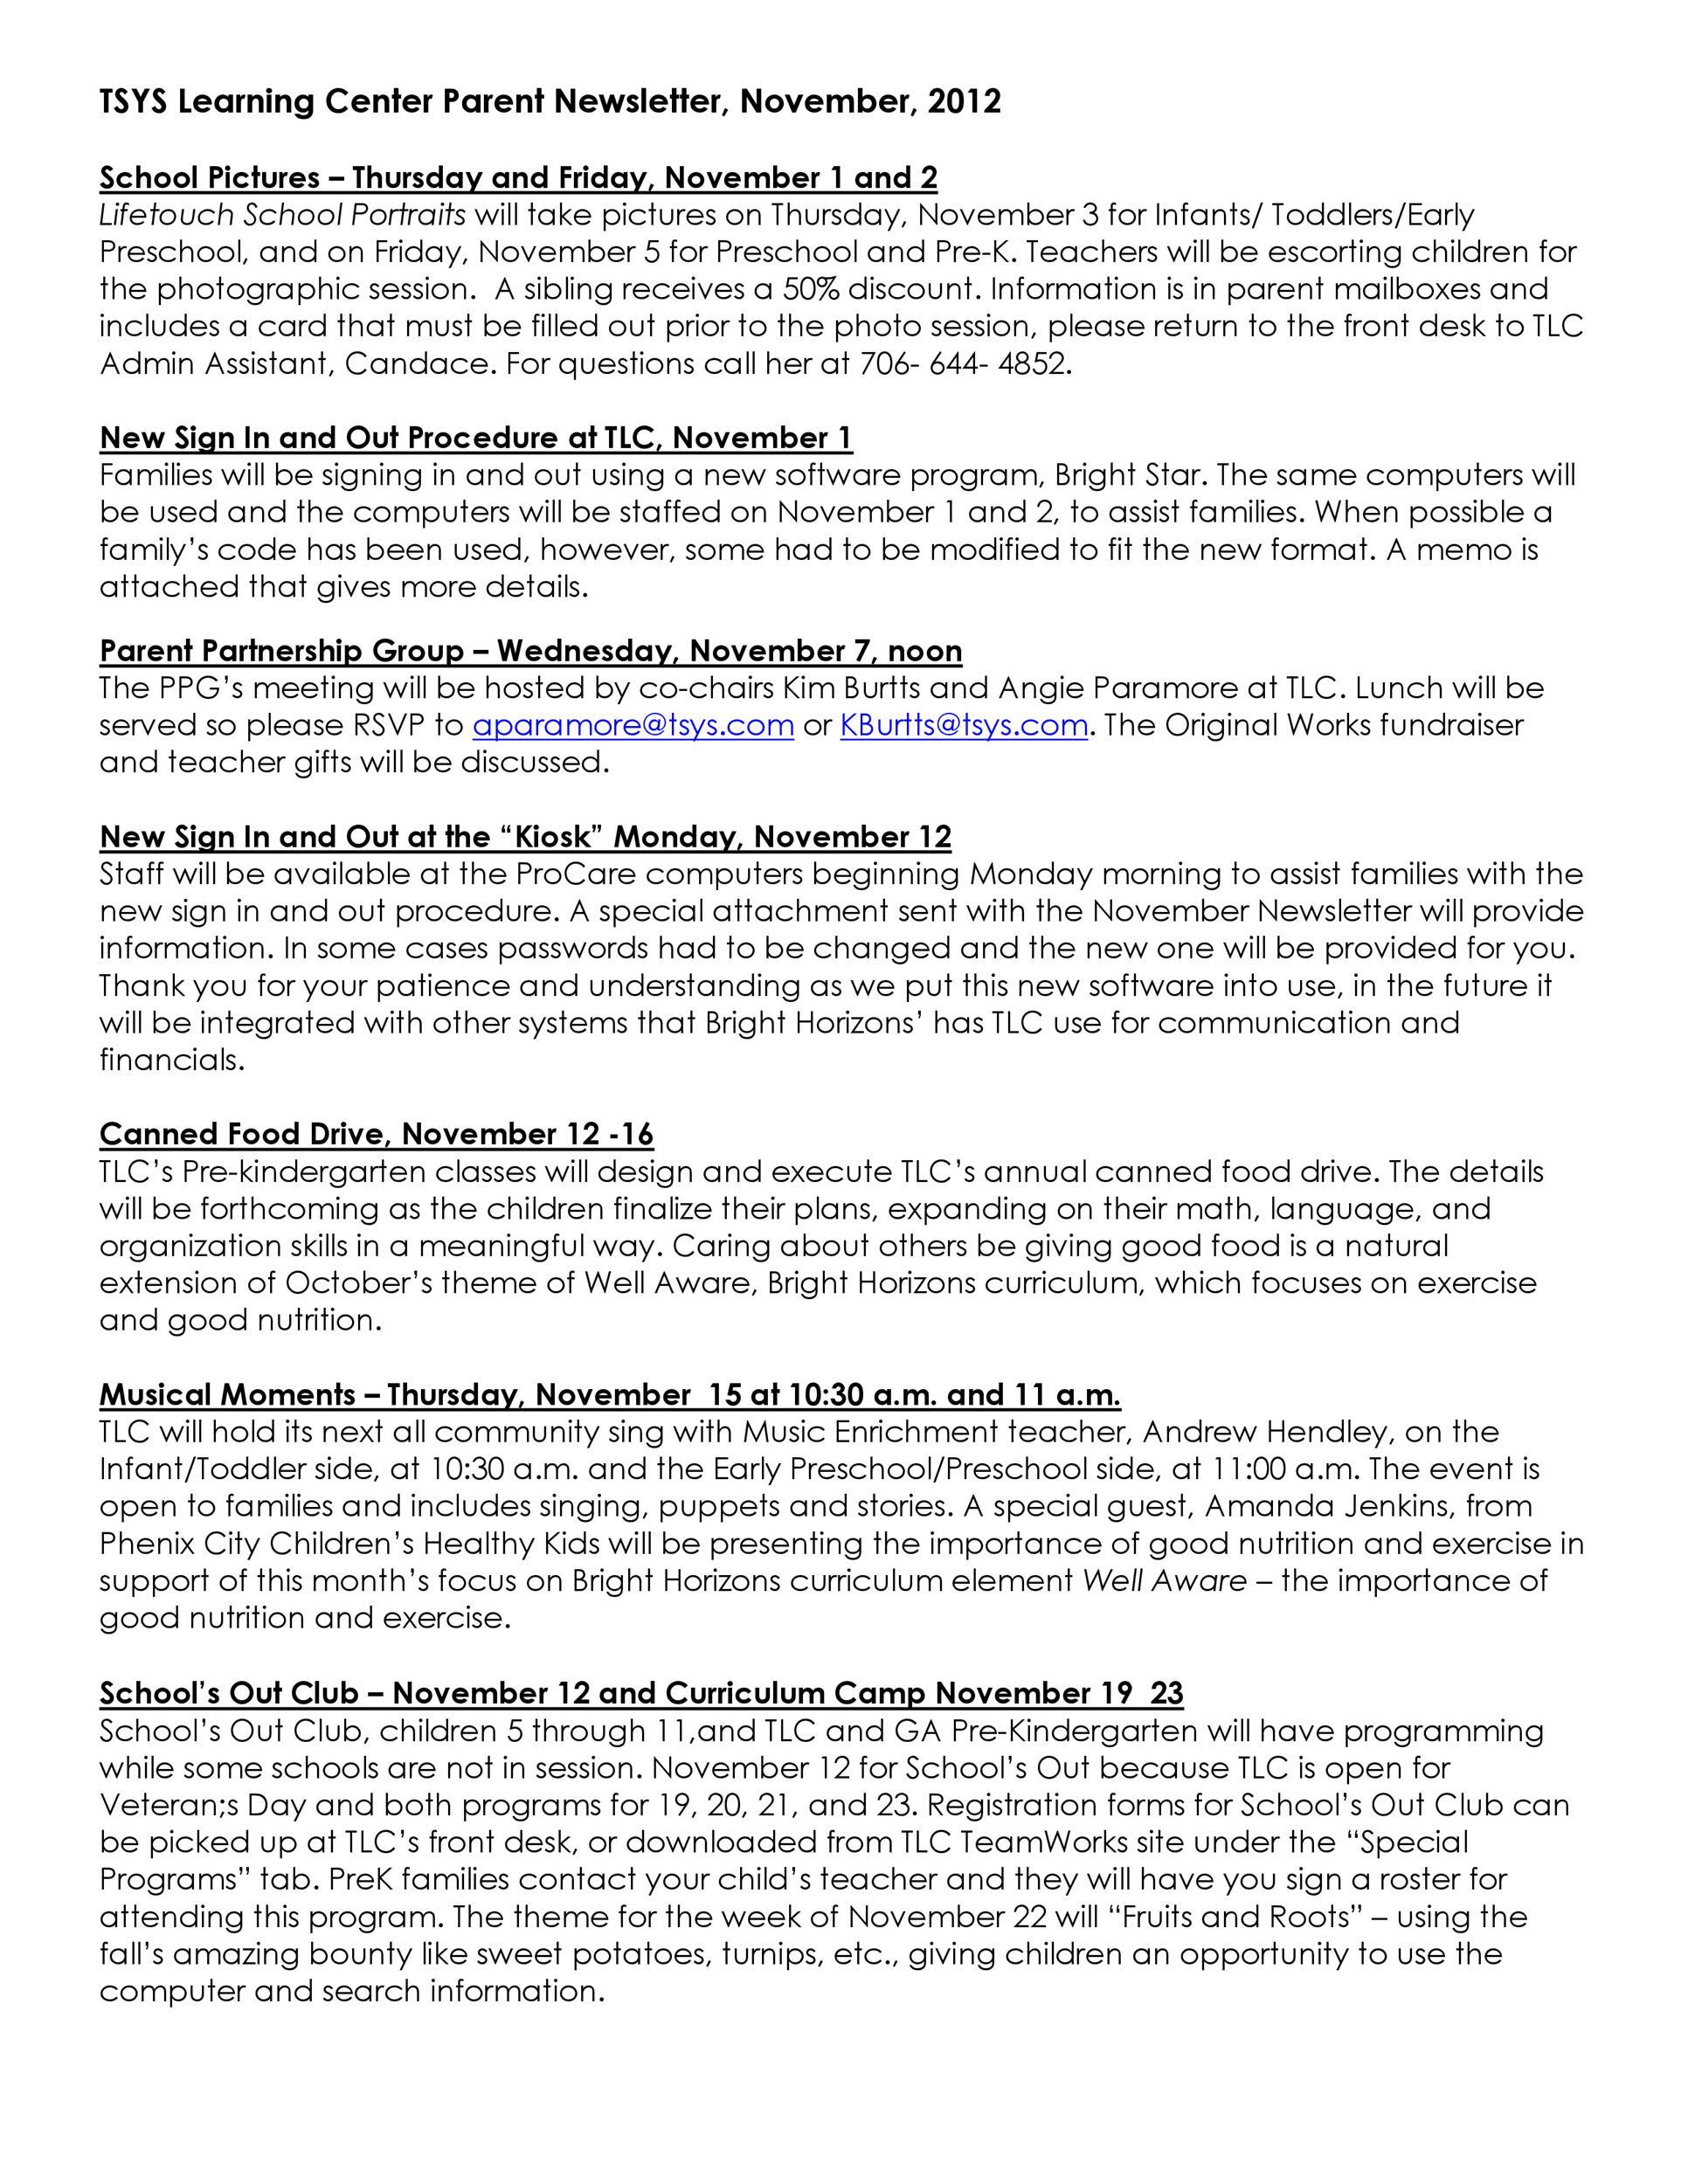 Free preschool newsletter template 32